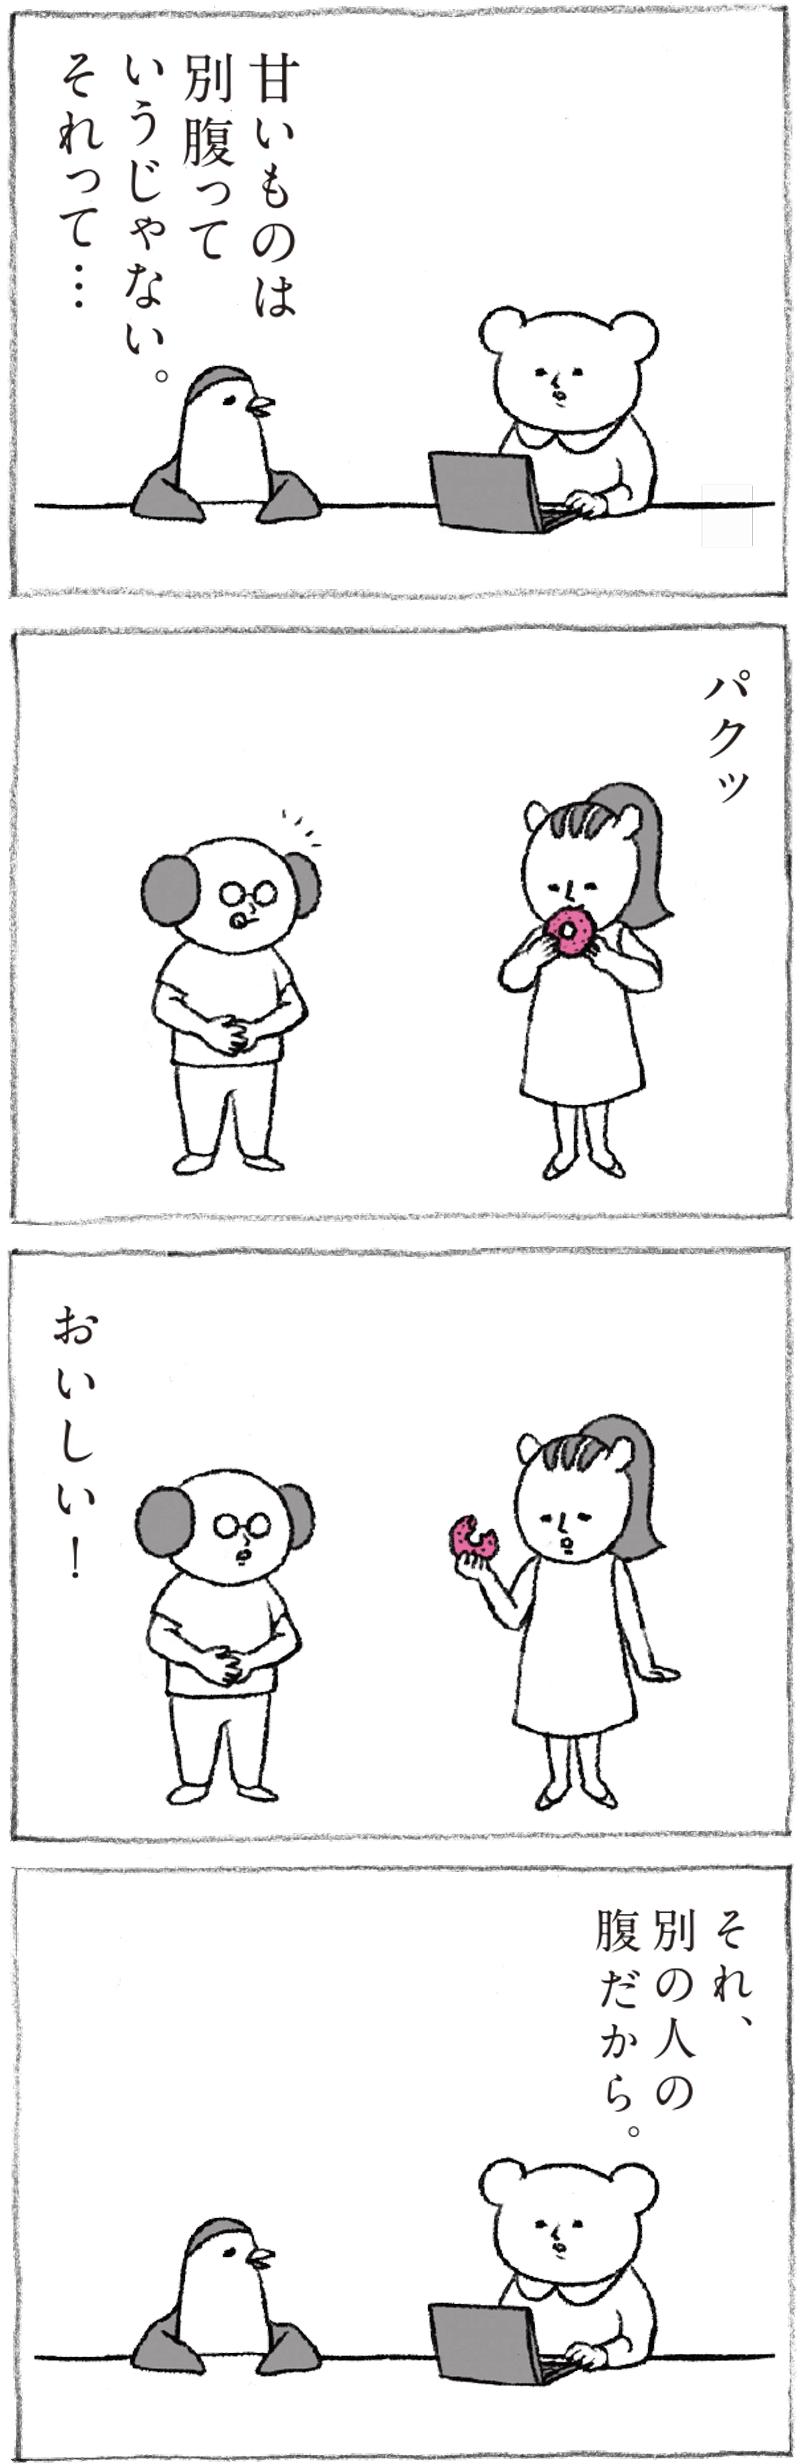 Hanako 1198号:おかわり自由